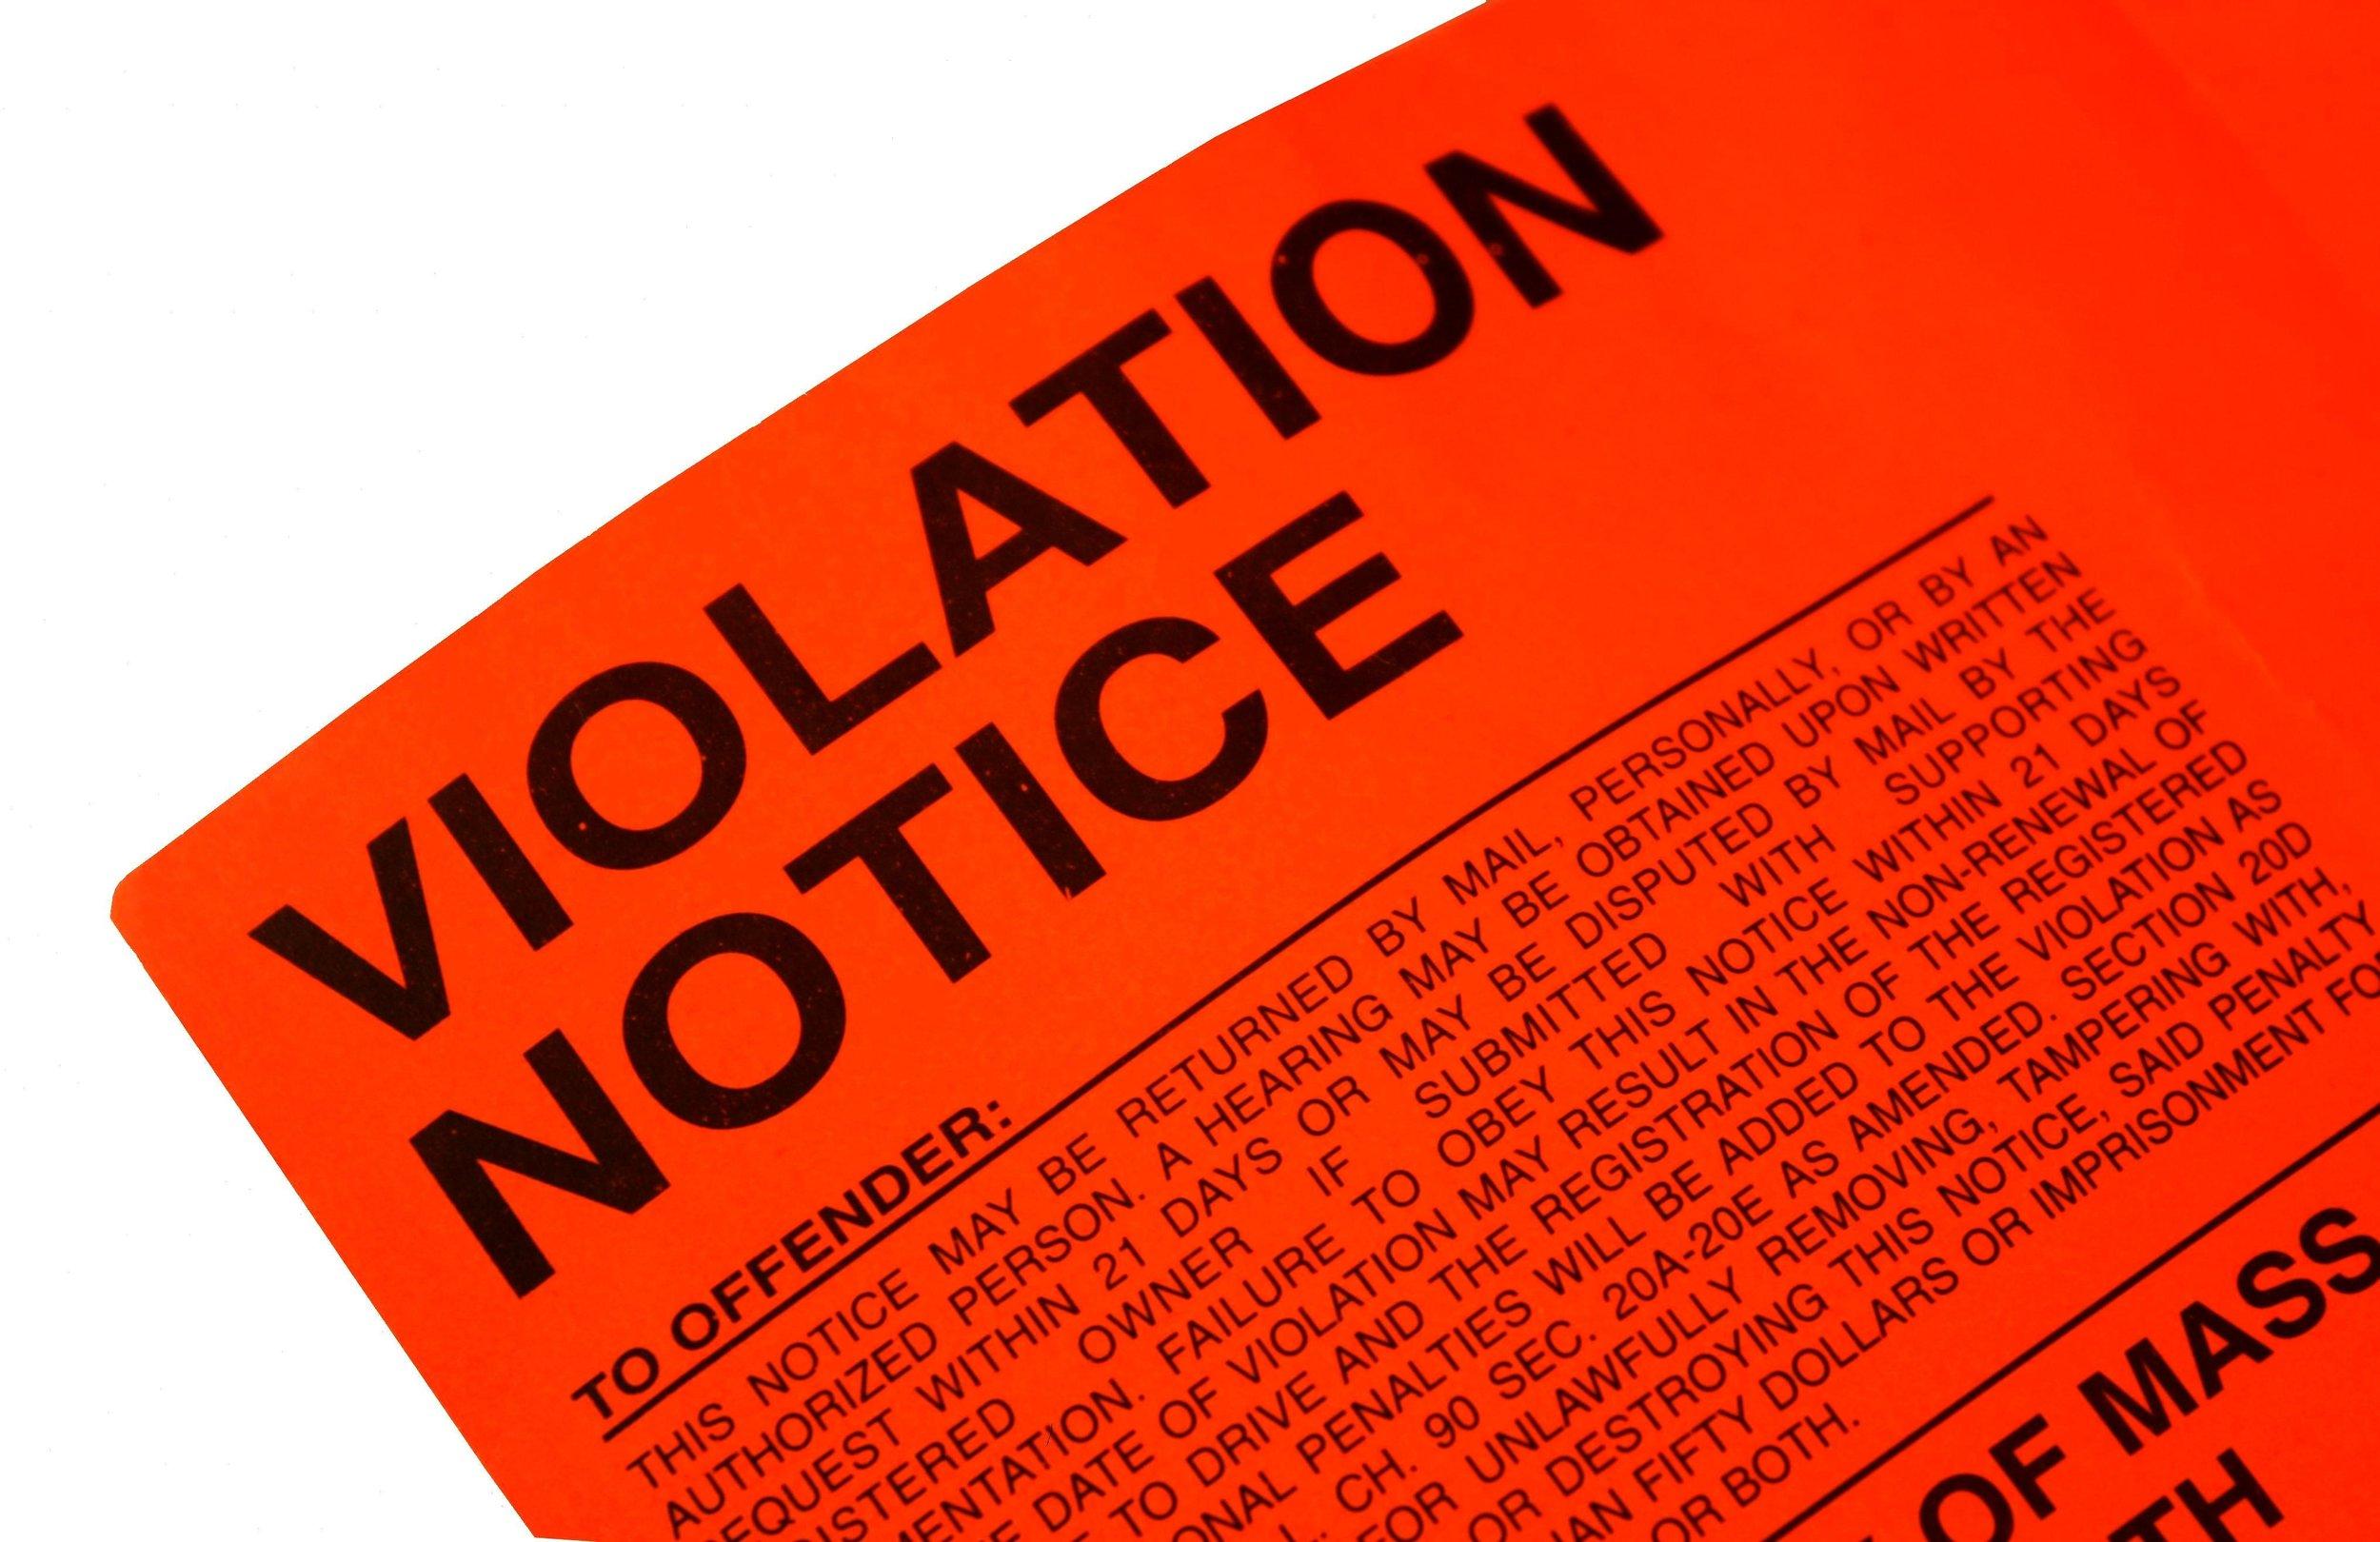 Plumbing violation corrections -